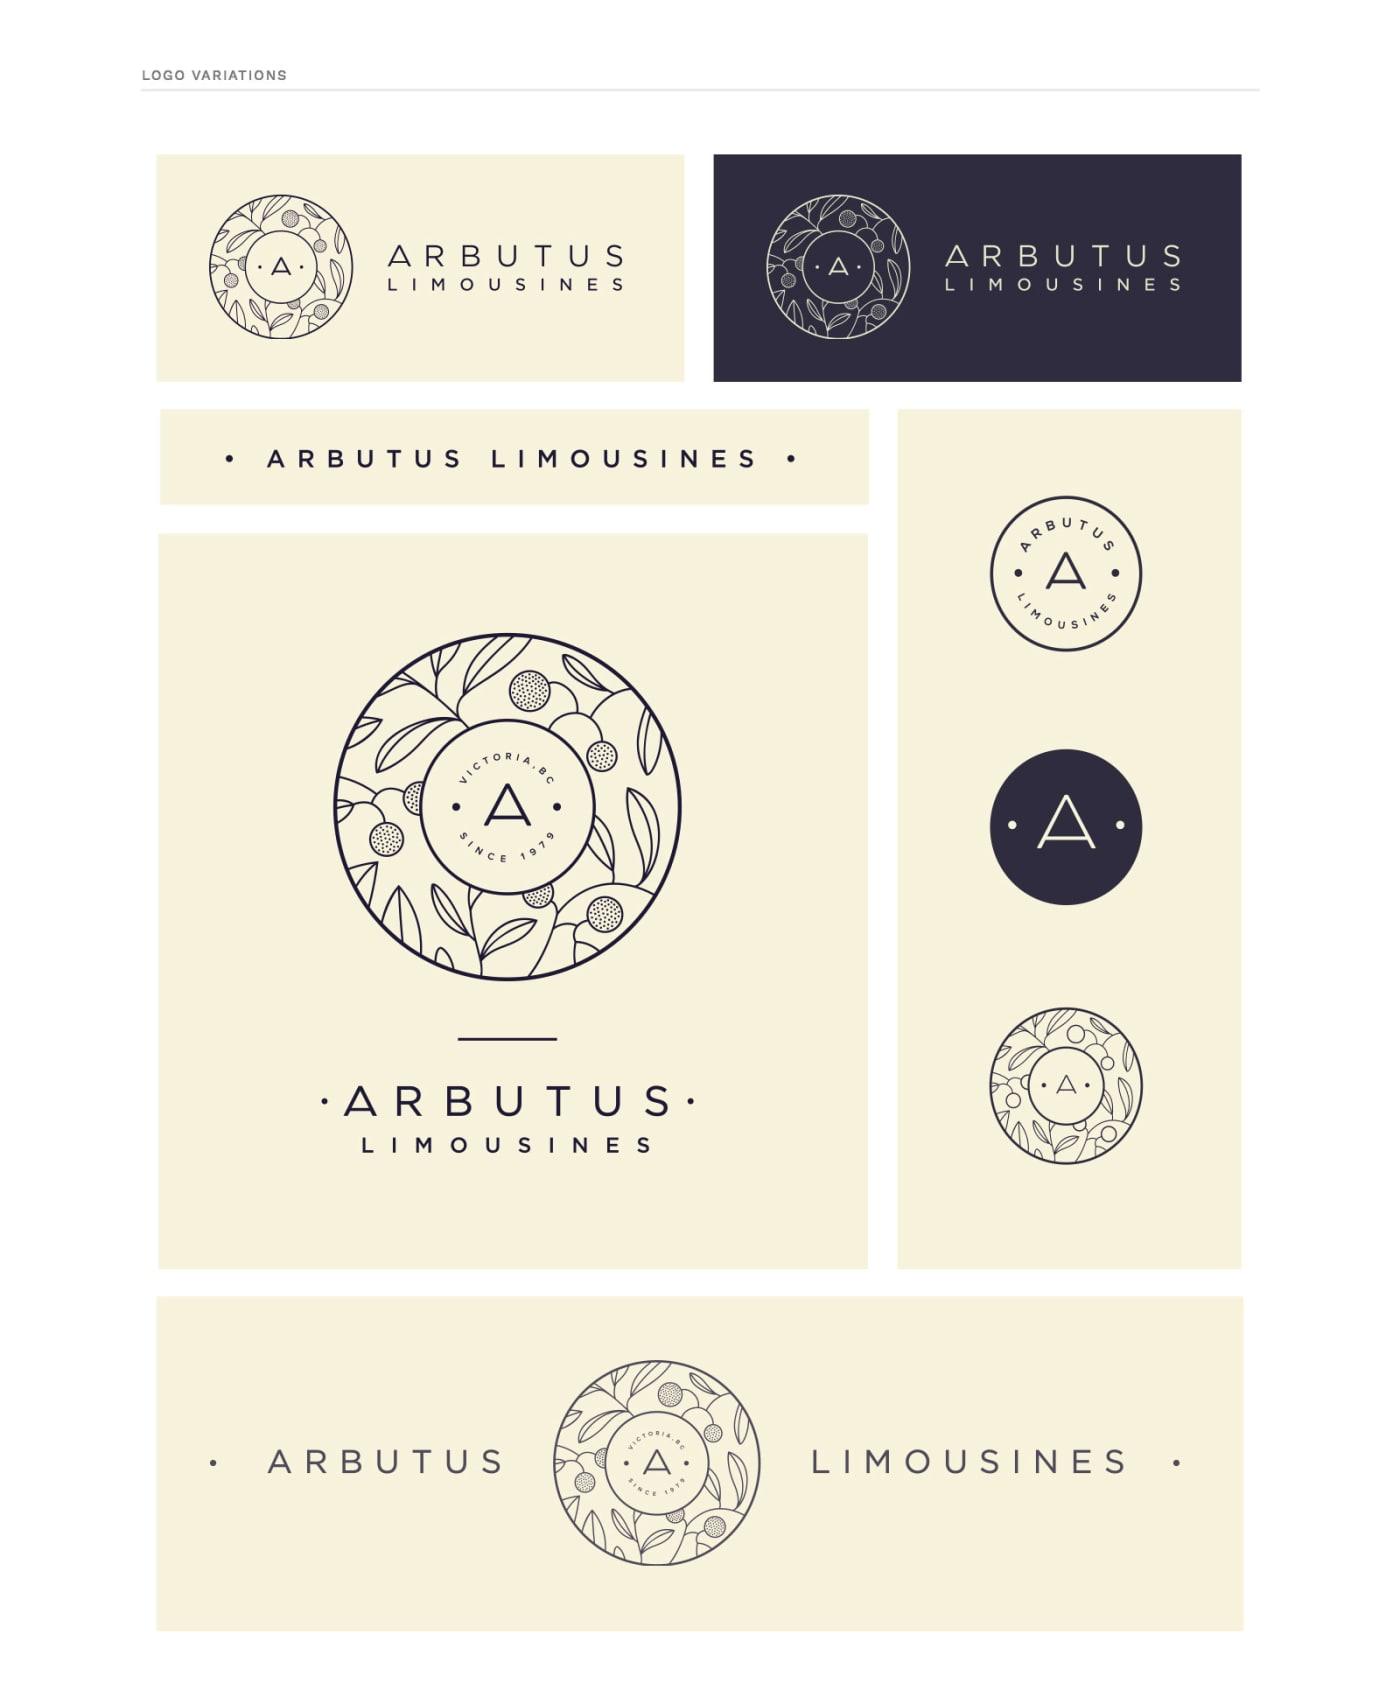 arbutus_logovariants